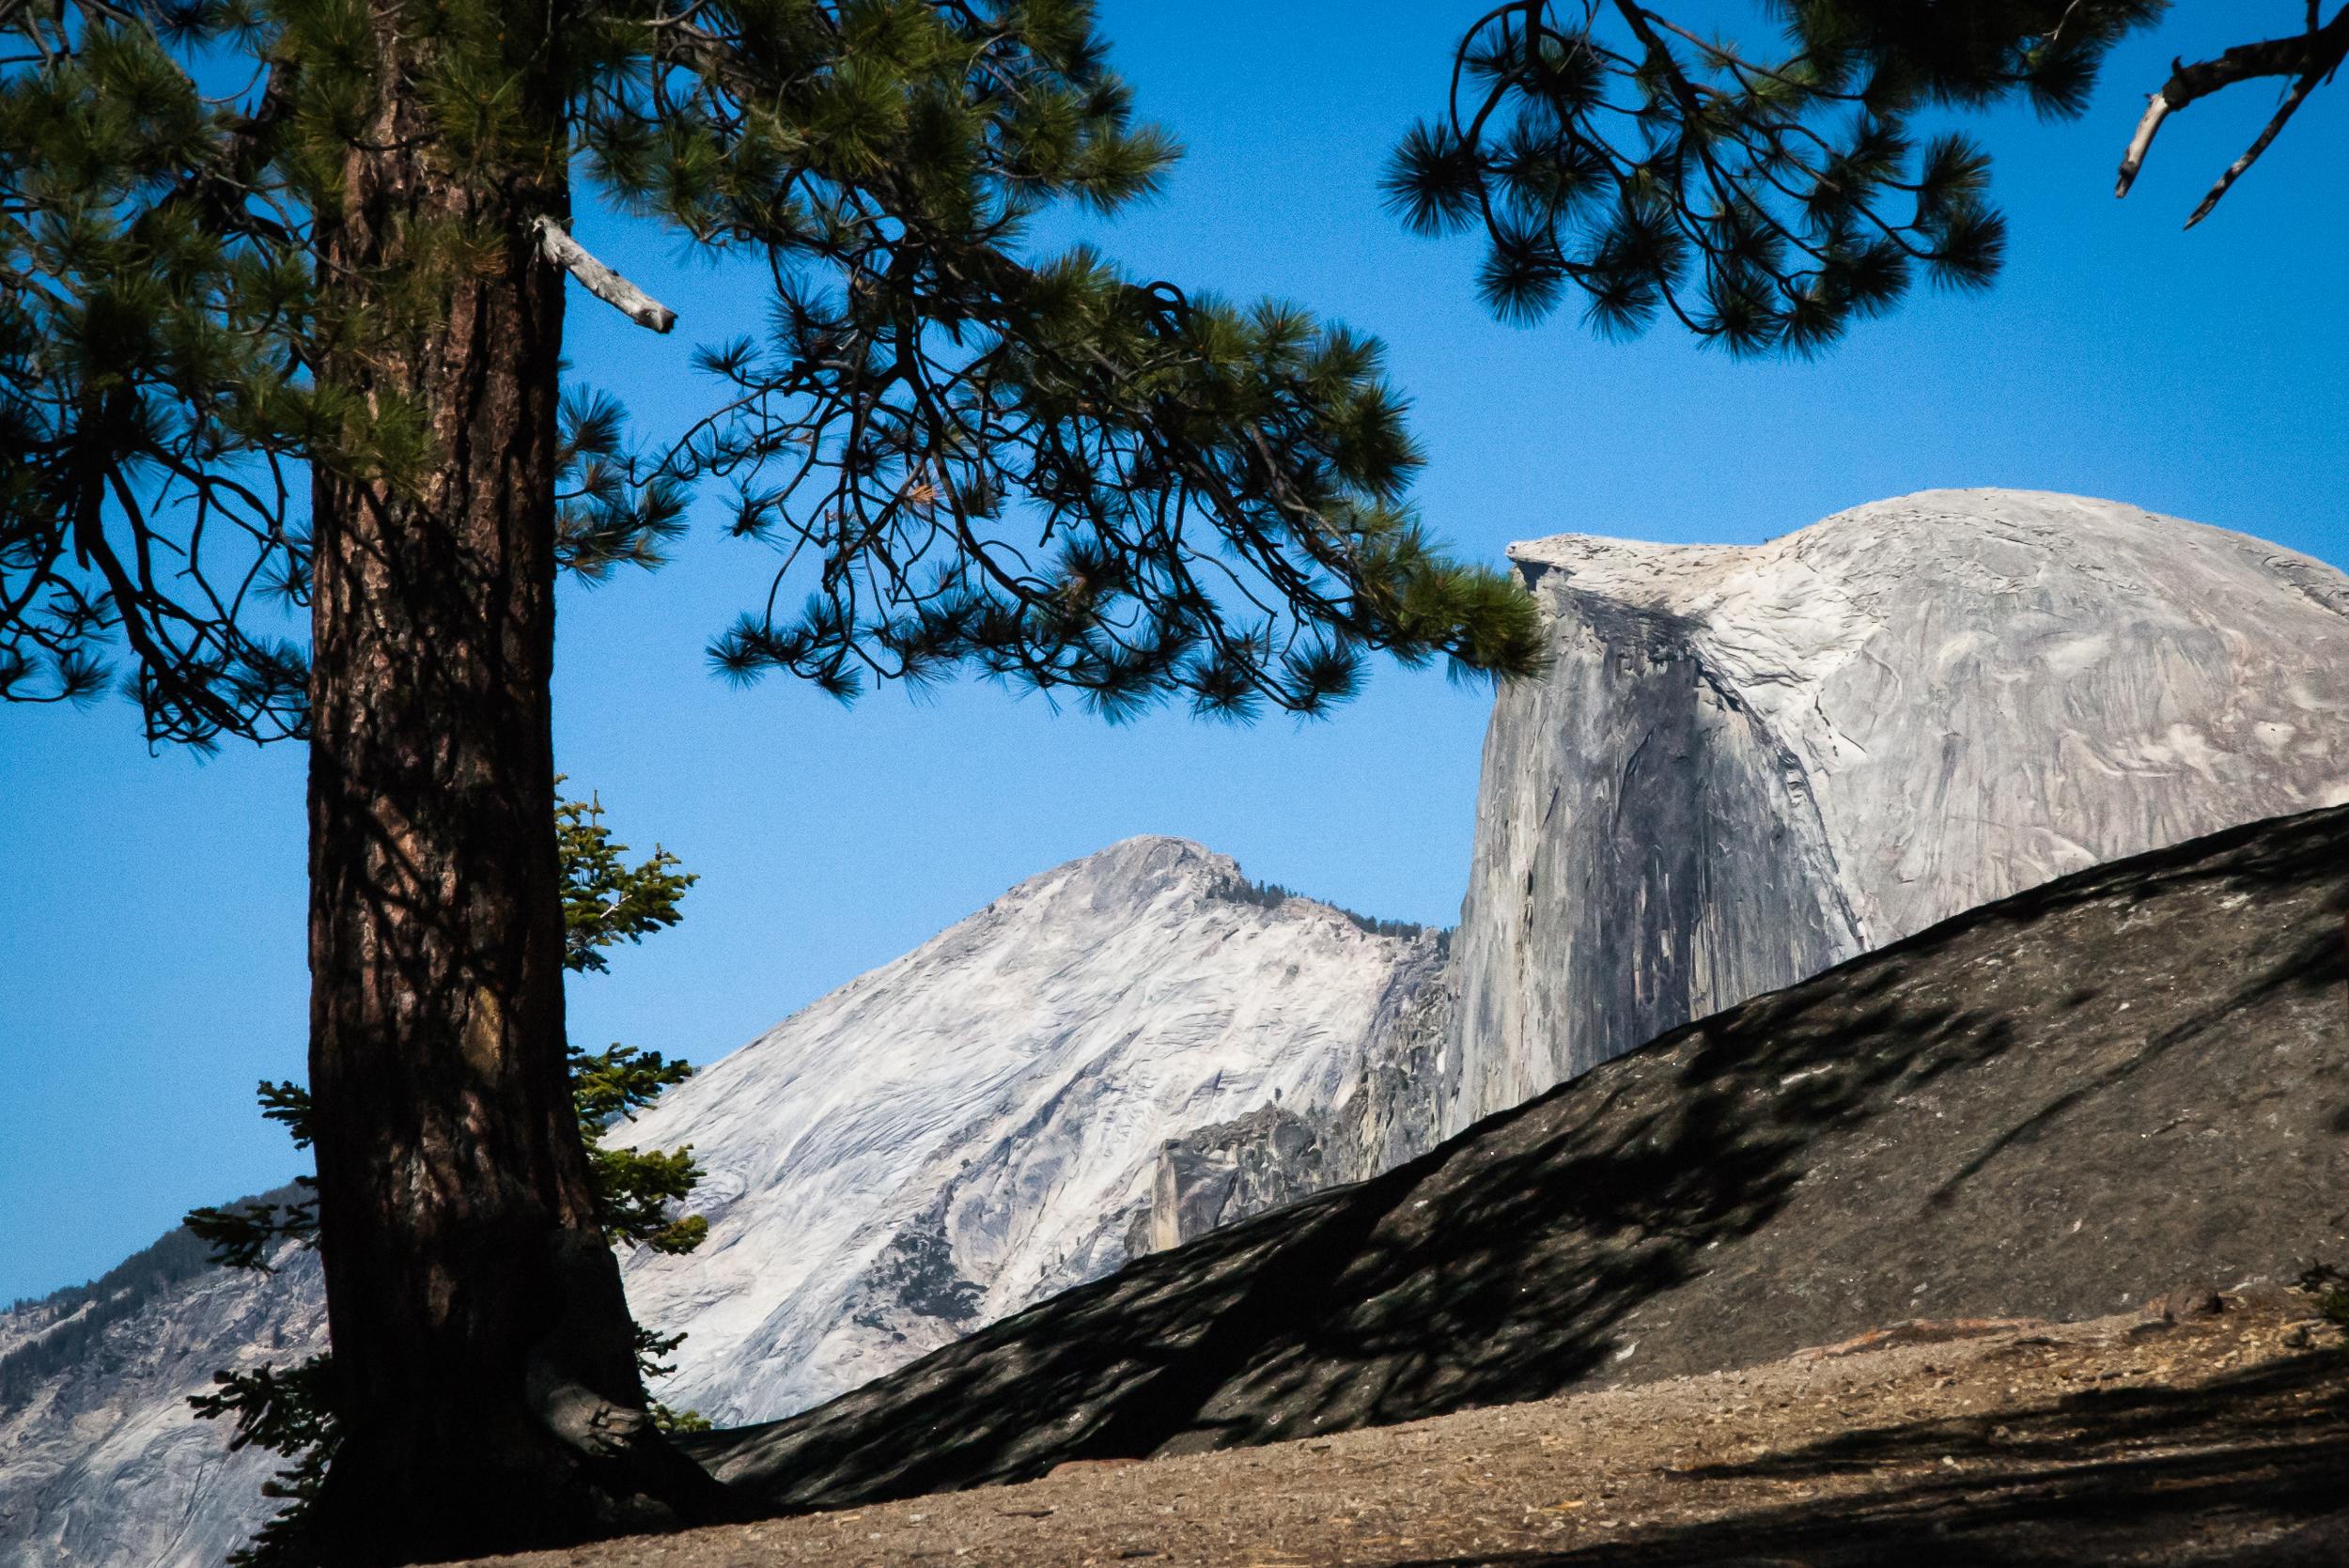 Yosemite card 1of2-277_2K.jpg